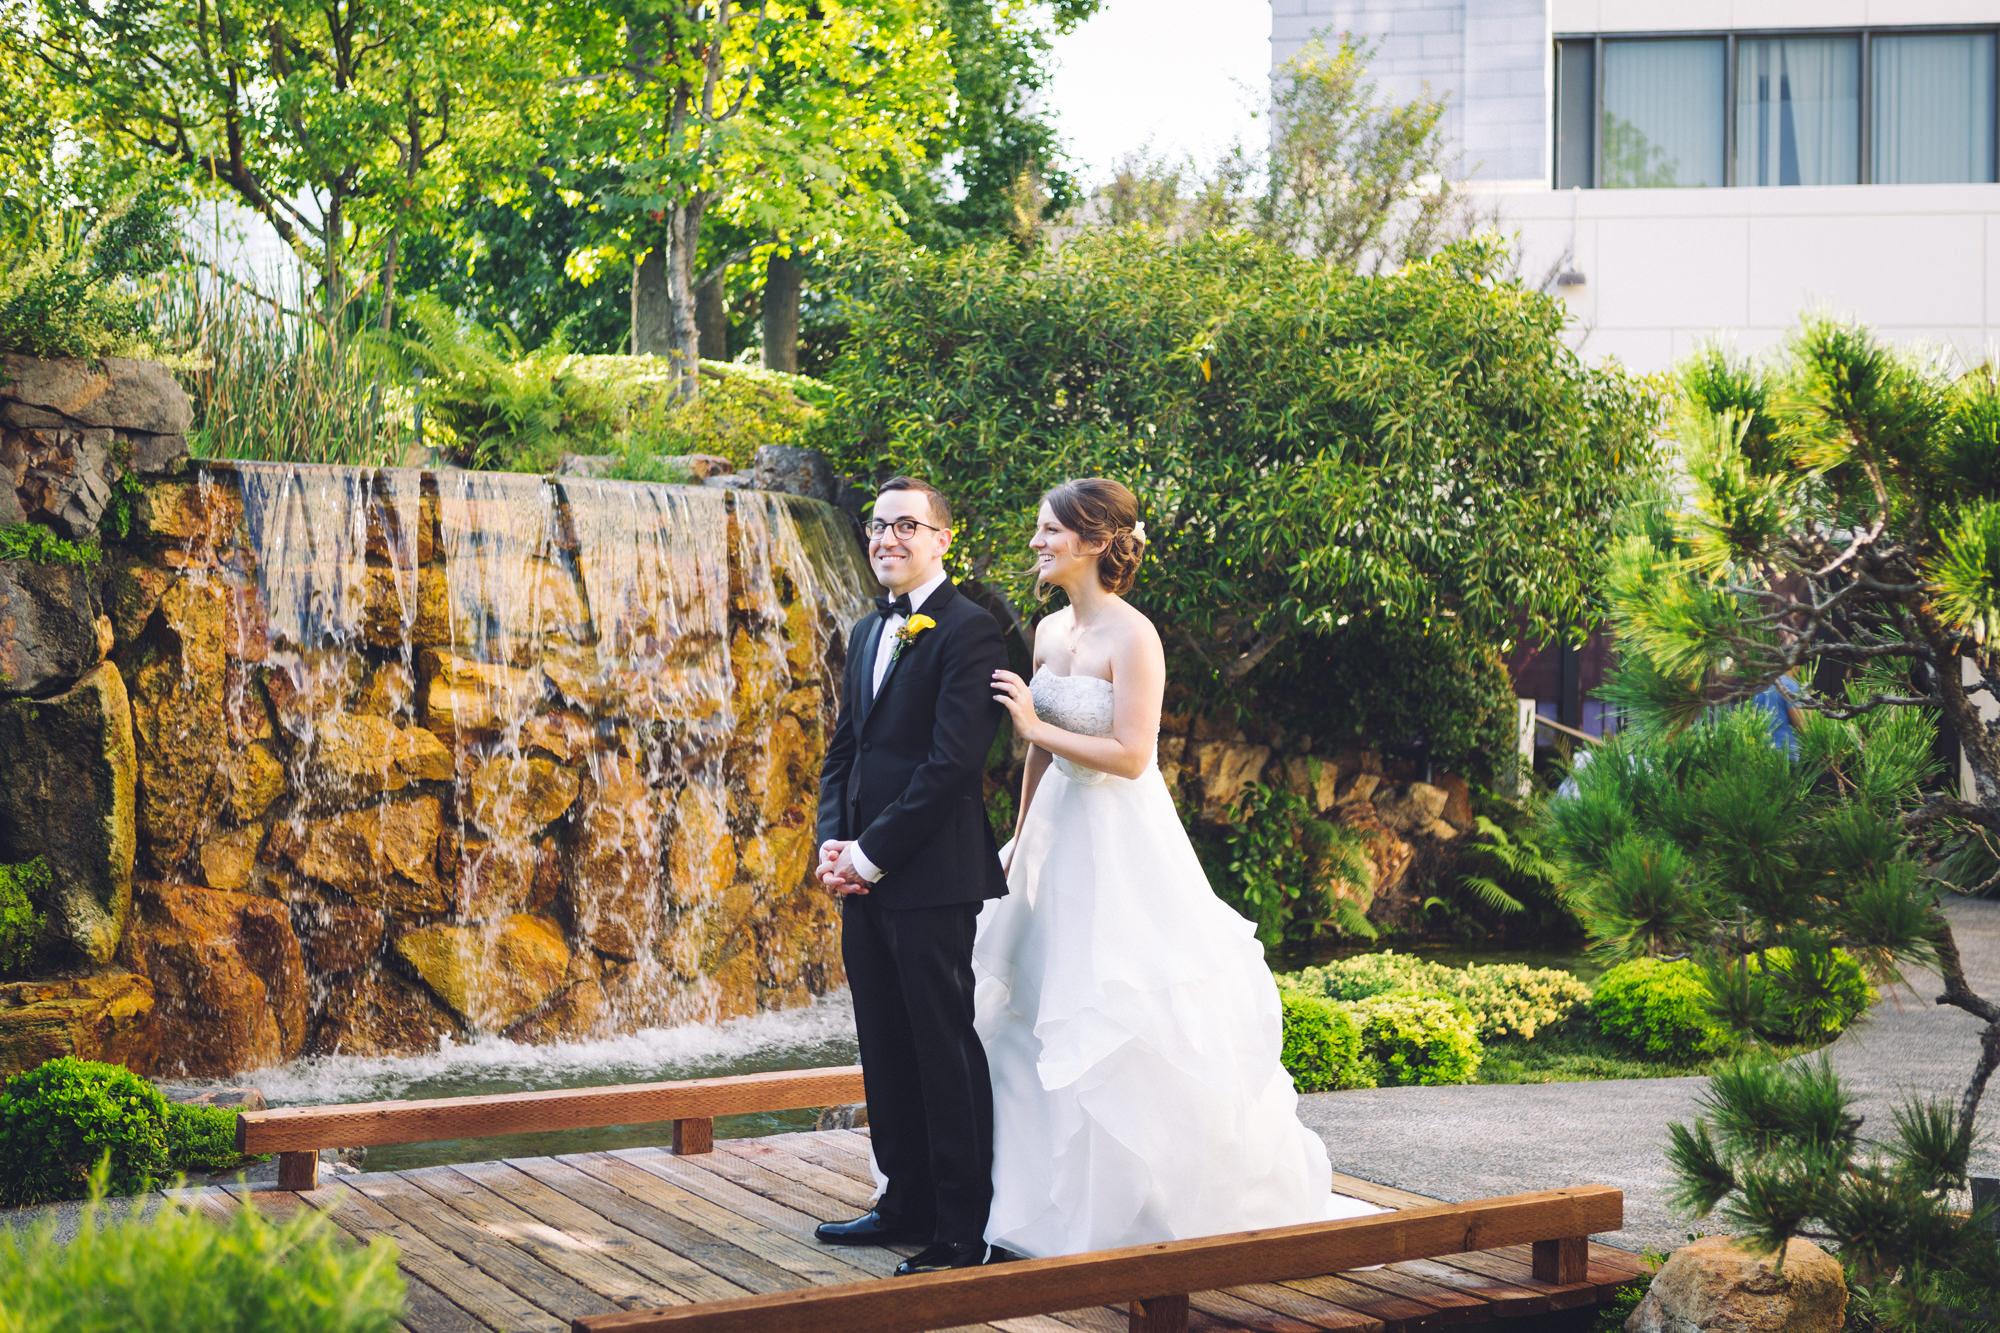 thelightandglass-wedding-engagement-photography-041.jpg